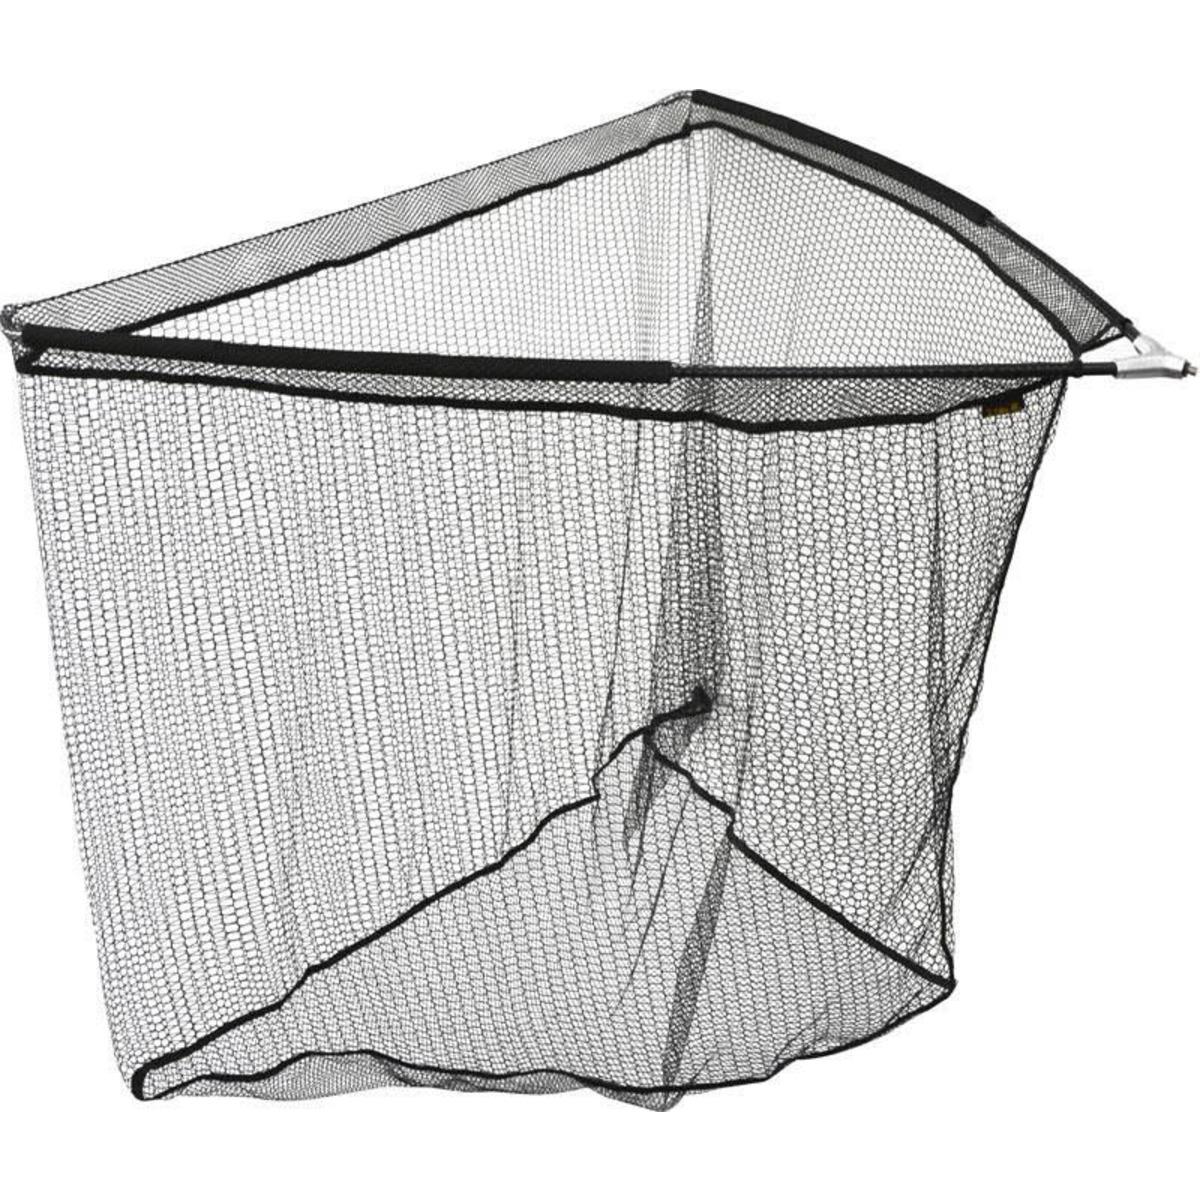 Radical Carp Landing Net Head - 1.00x1.00x0.80 m - 10x16 mm